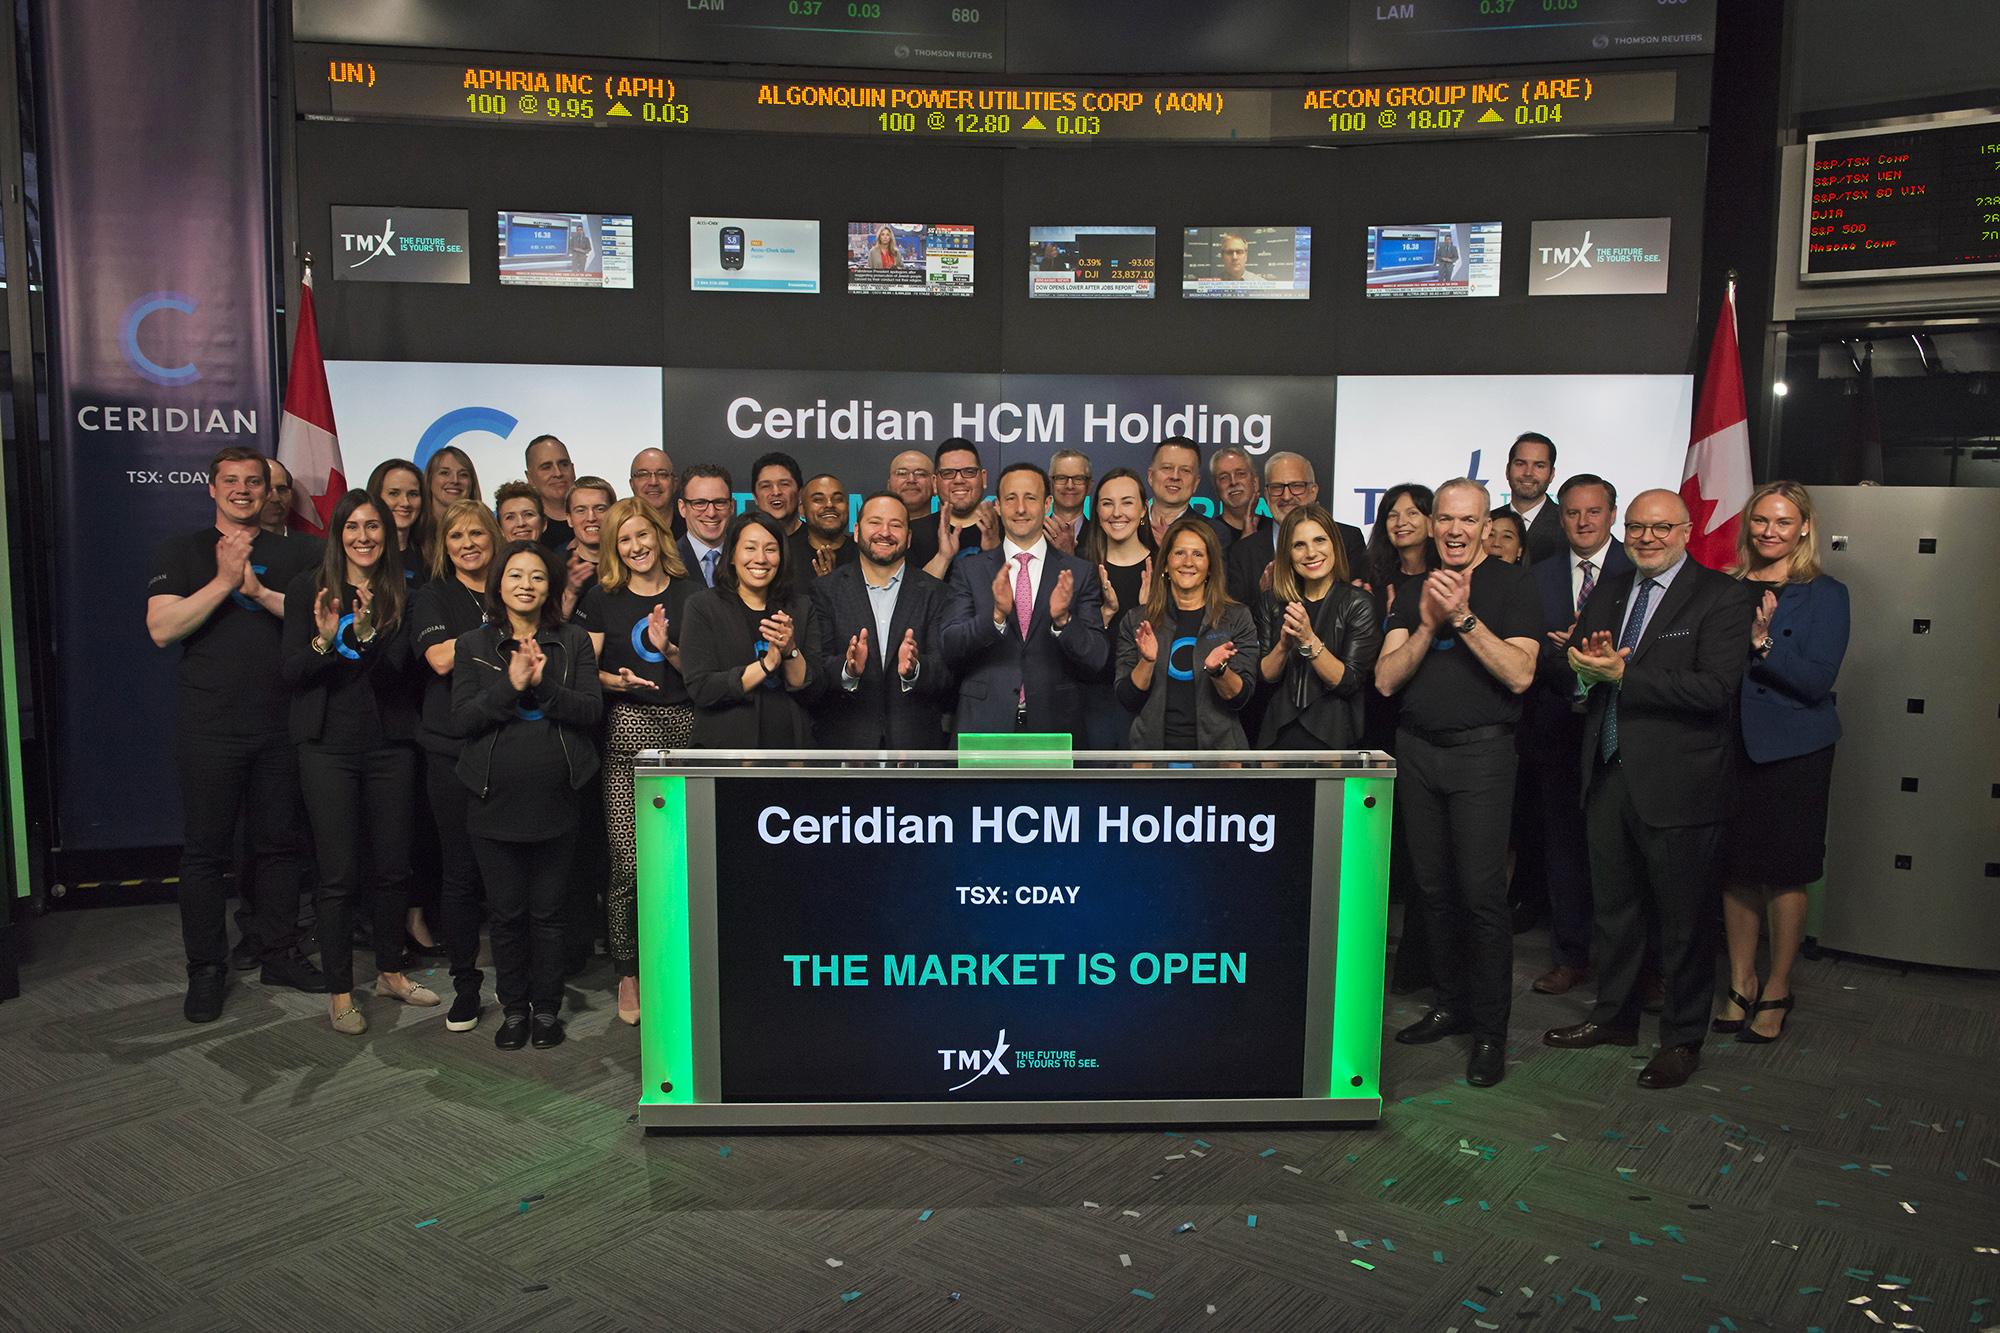 Ceridian HCM Holding Market Open